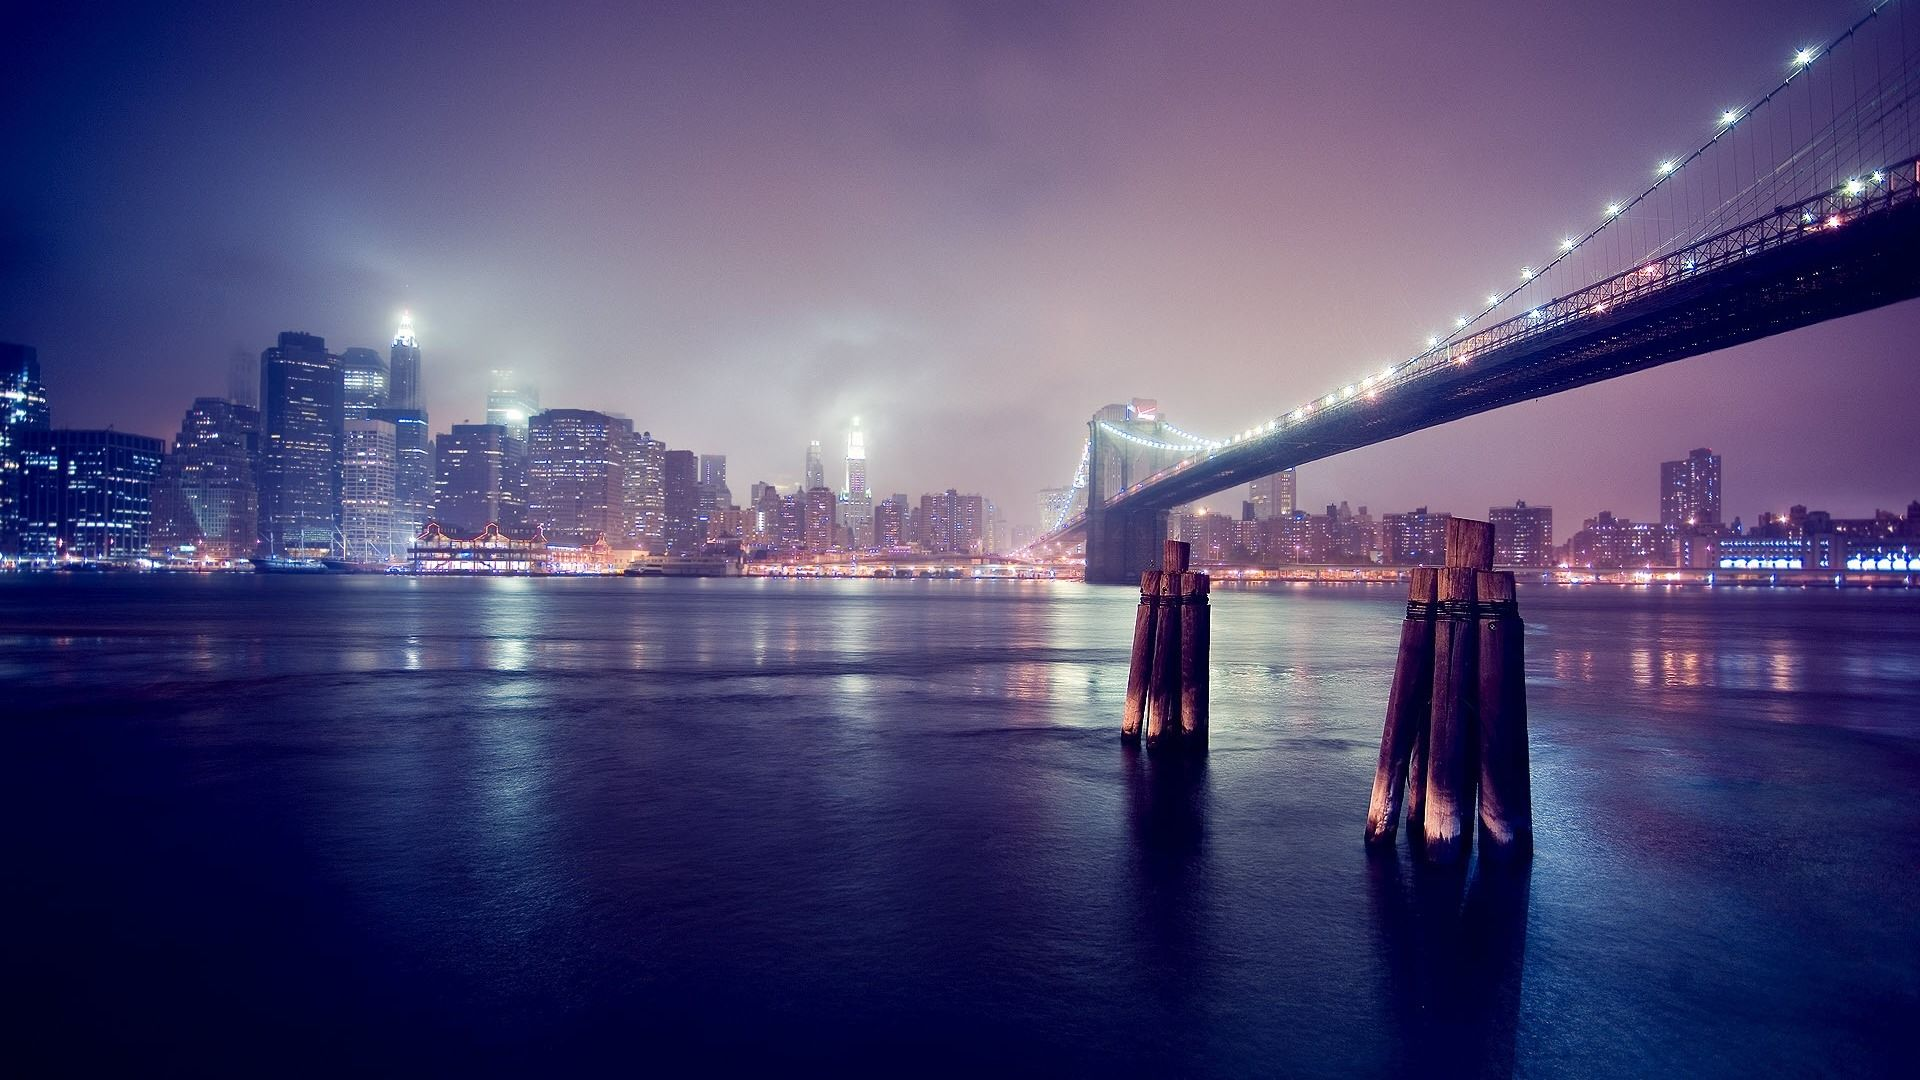 Beautiful City At Night Photography Desktop Wallpaper 1920x1080 Wallpaper Download Bridge Wallpaper Night Skyline Night City